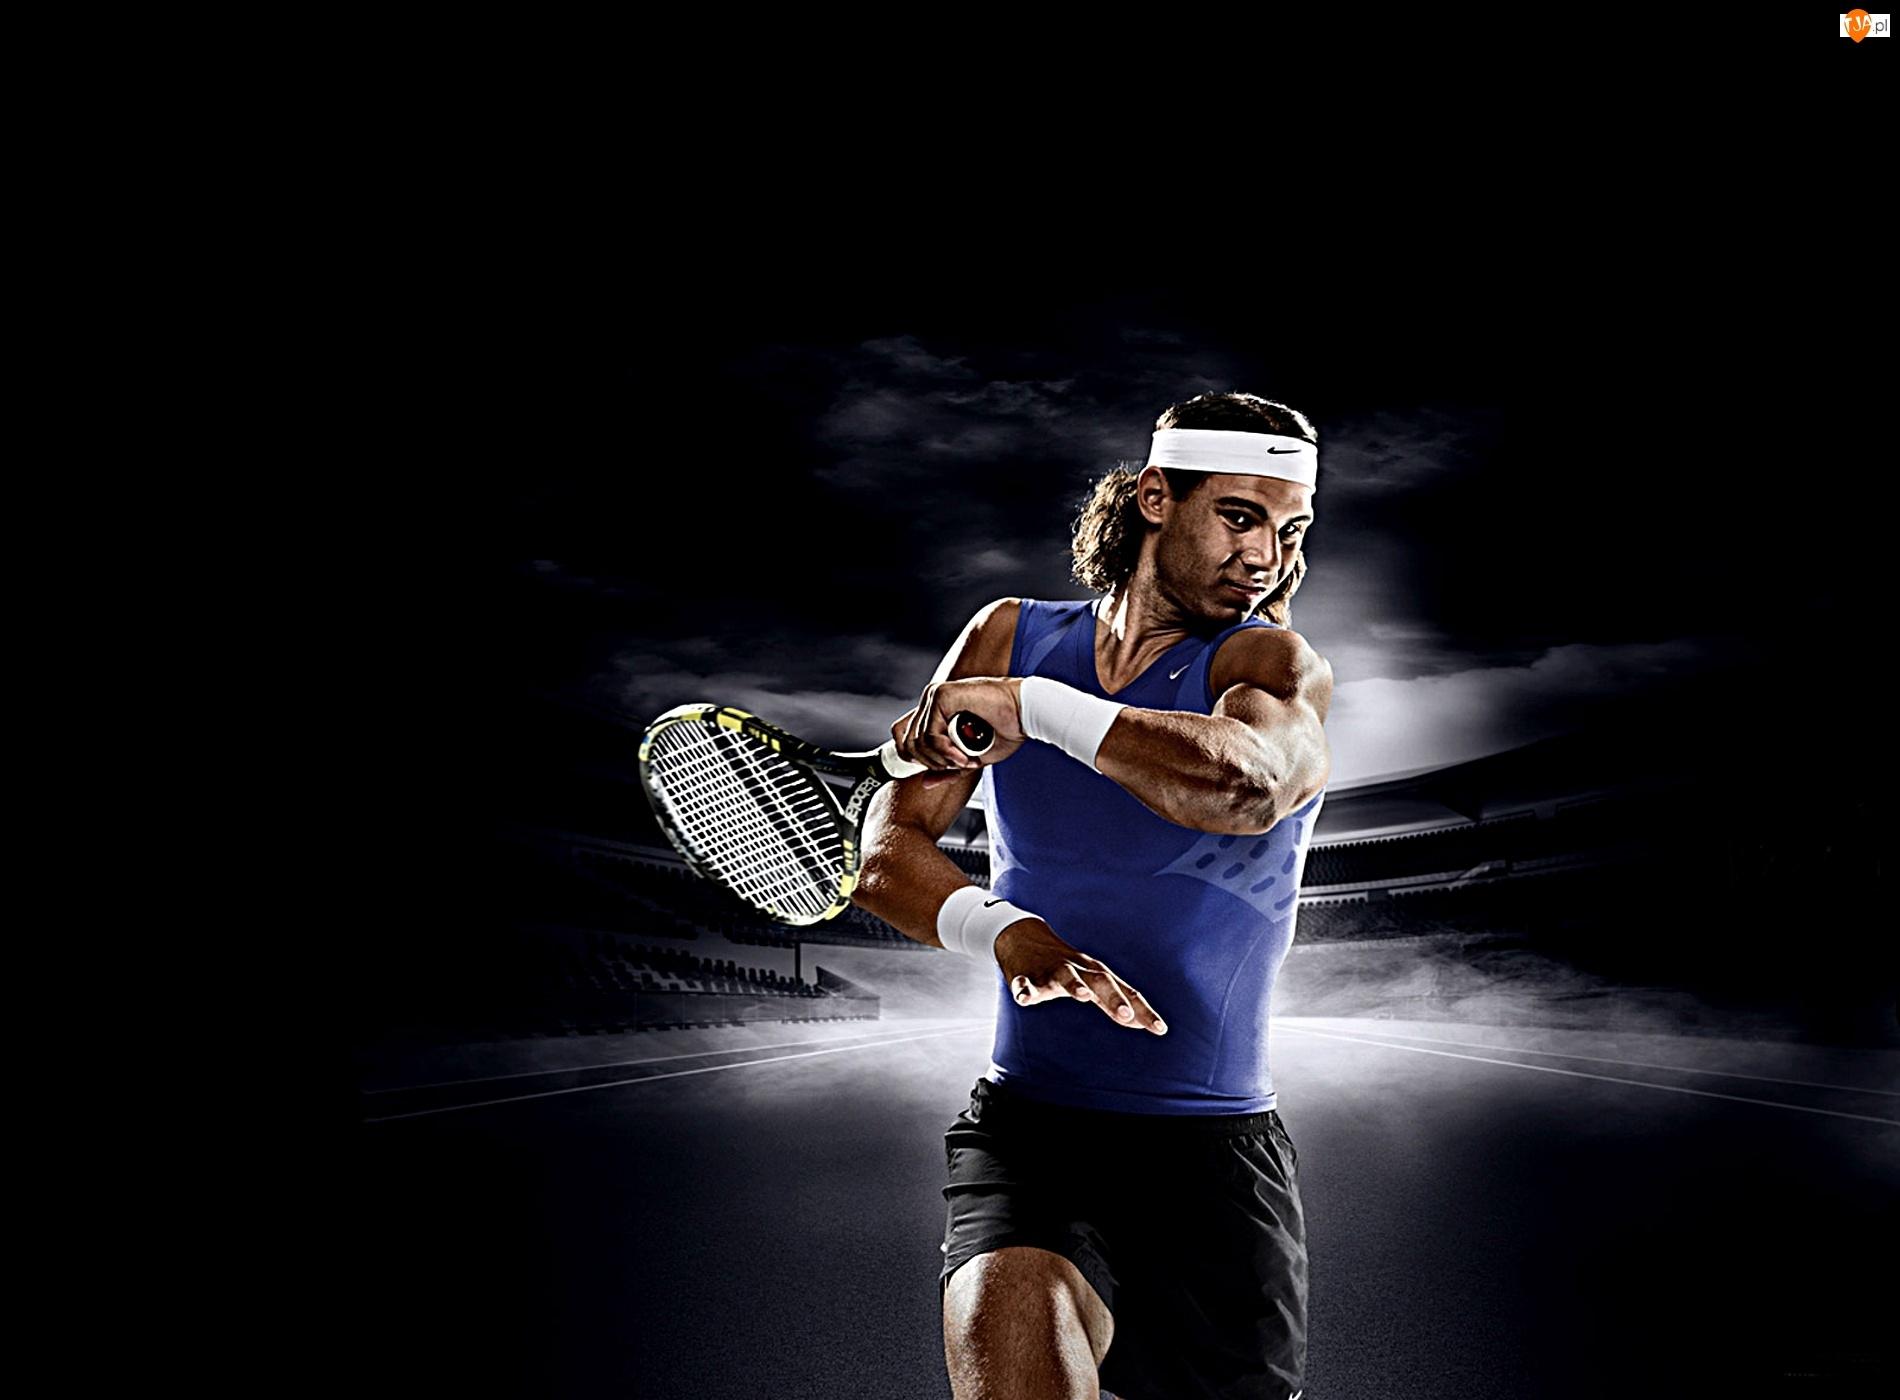 Rafael Nadal, rakieta tenisowa, tenis, sport